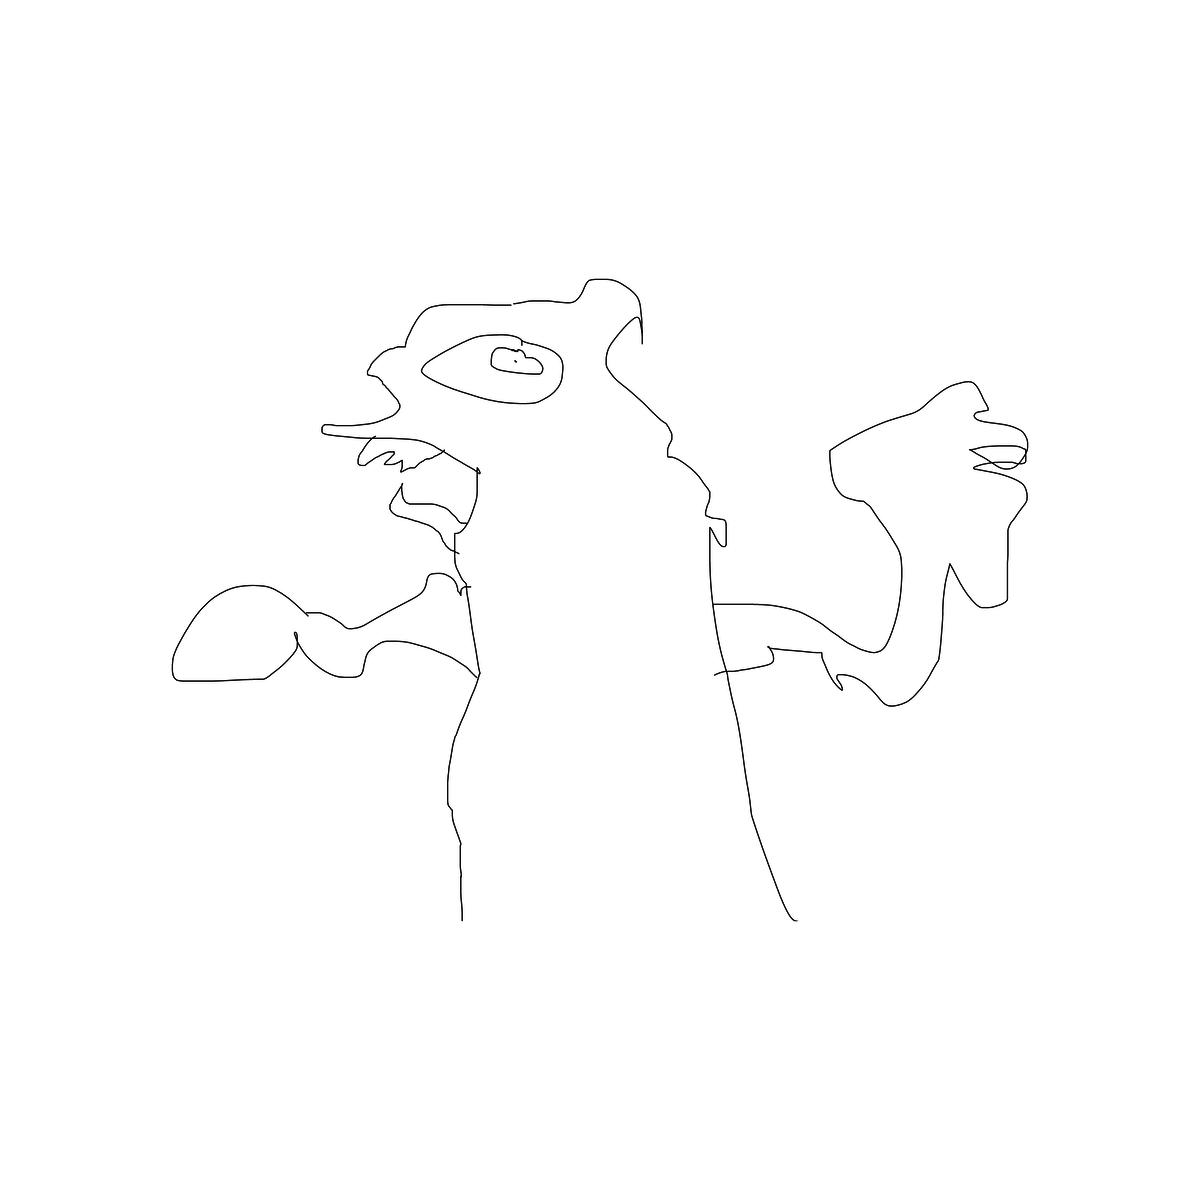 BAAAM drawing#1863 lat:56.3373565673828100lng: -2.8200113773345947